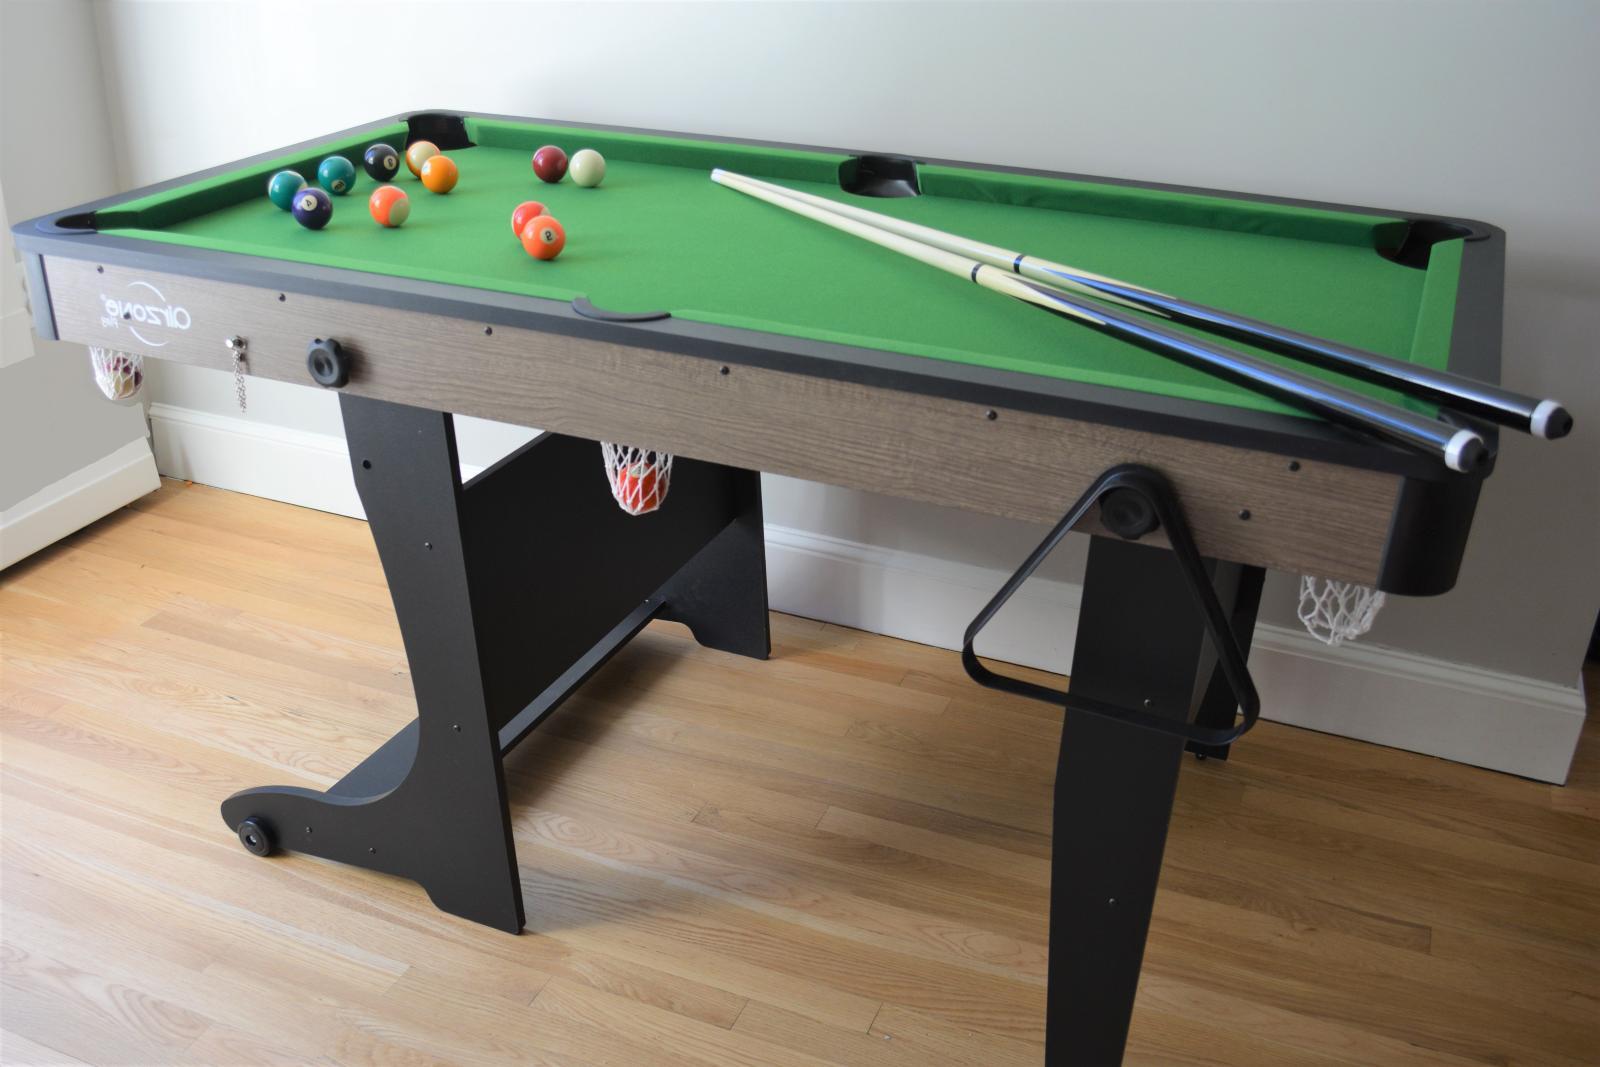 5' Billiard Pool Table Game Play